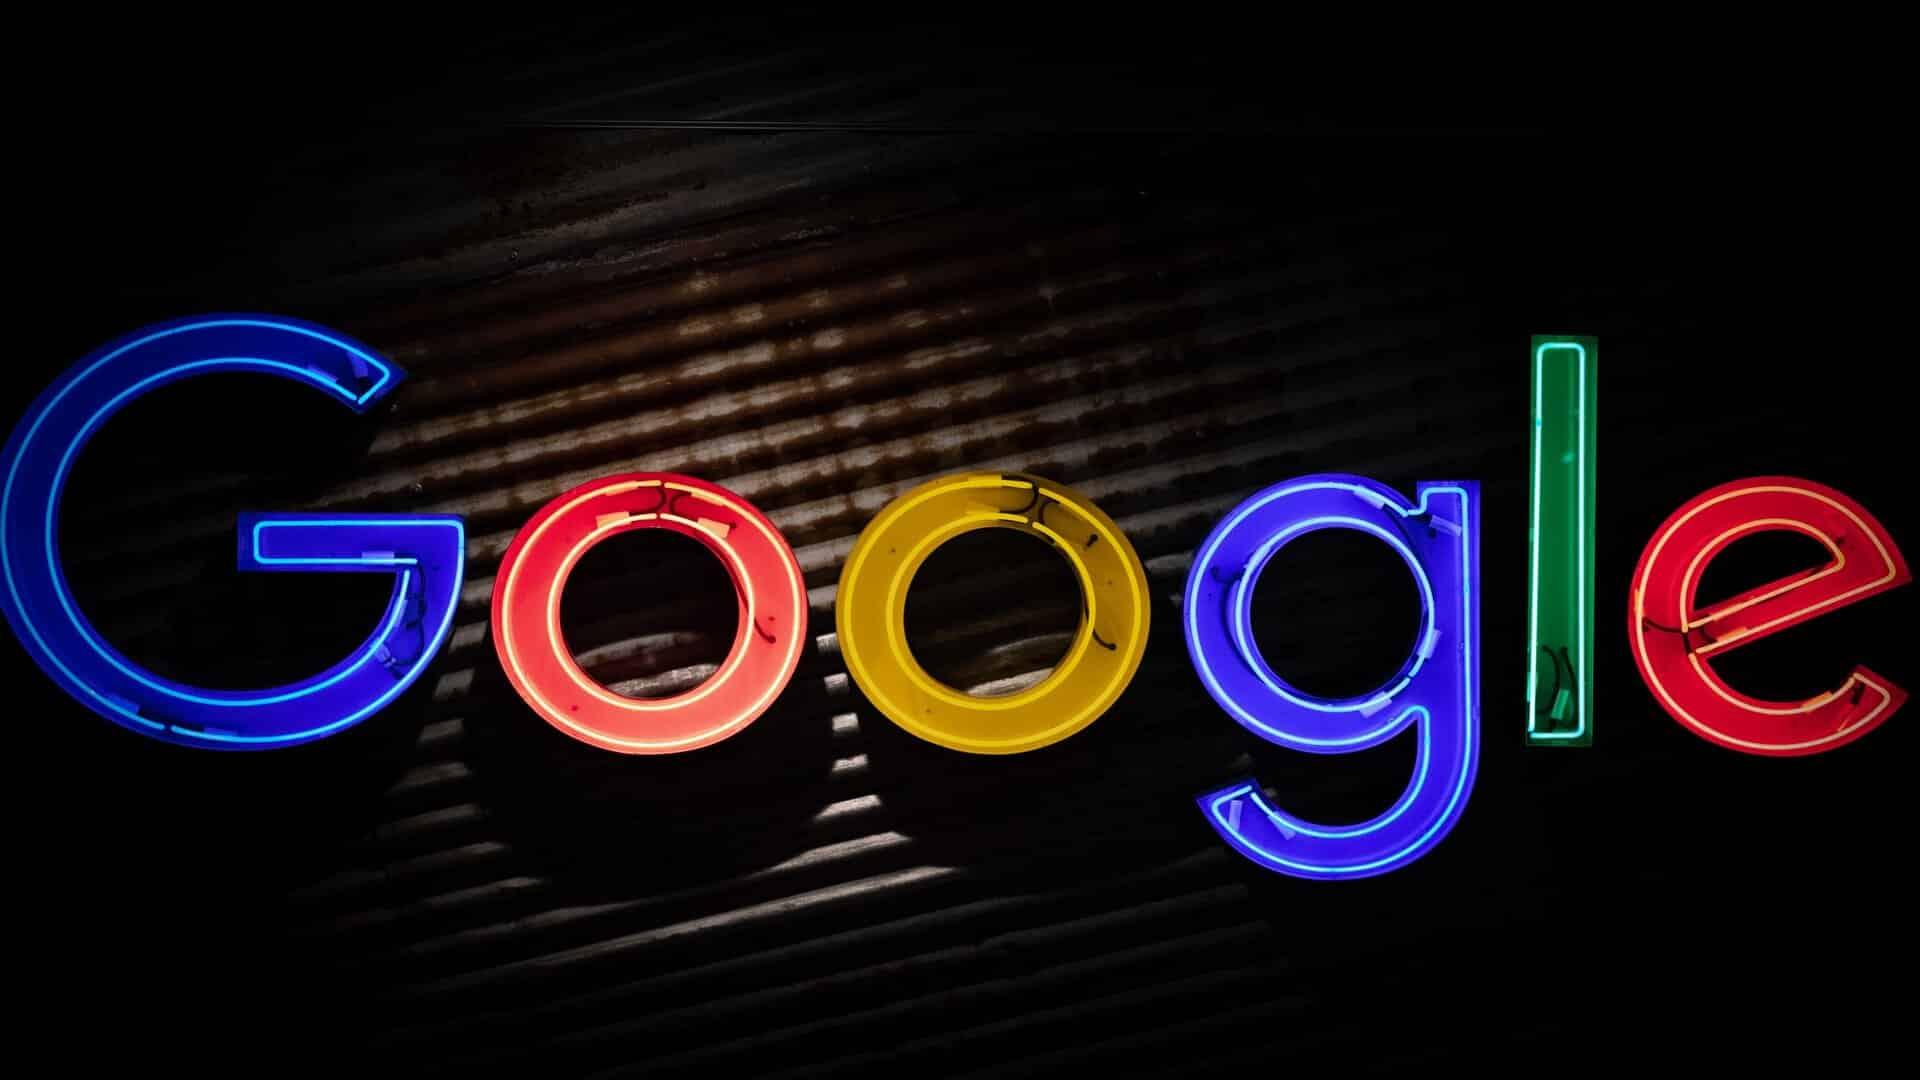 South Korea regulator slaps Google with $176.9 million fine